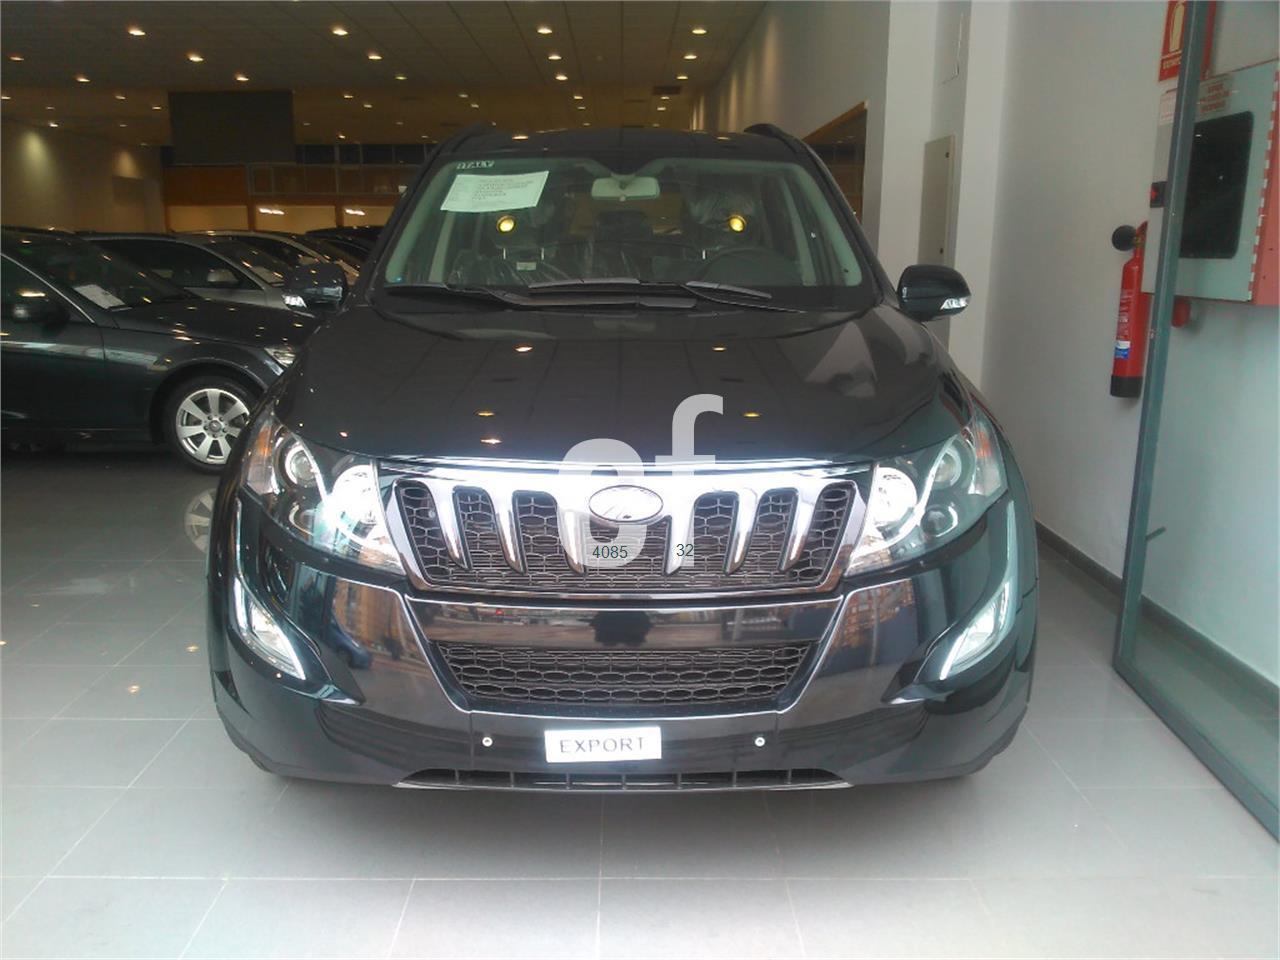 MAHINDRA XUV500 de venta de venta por 21585